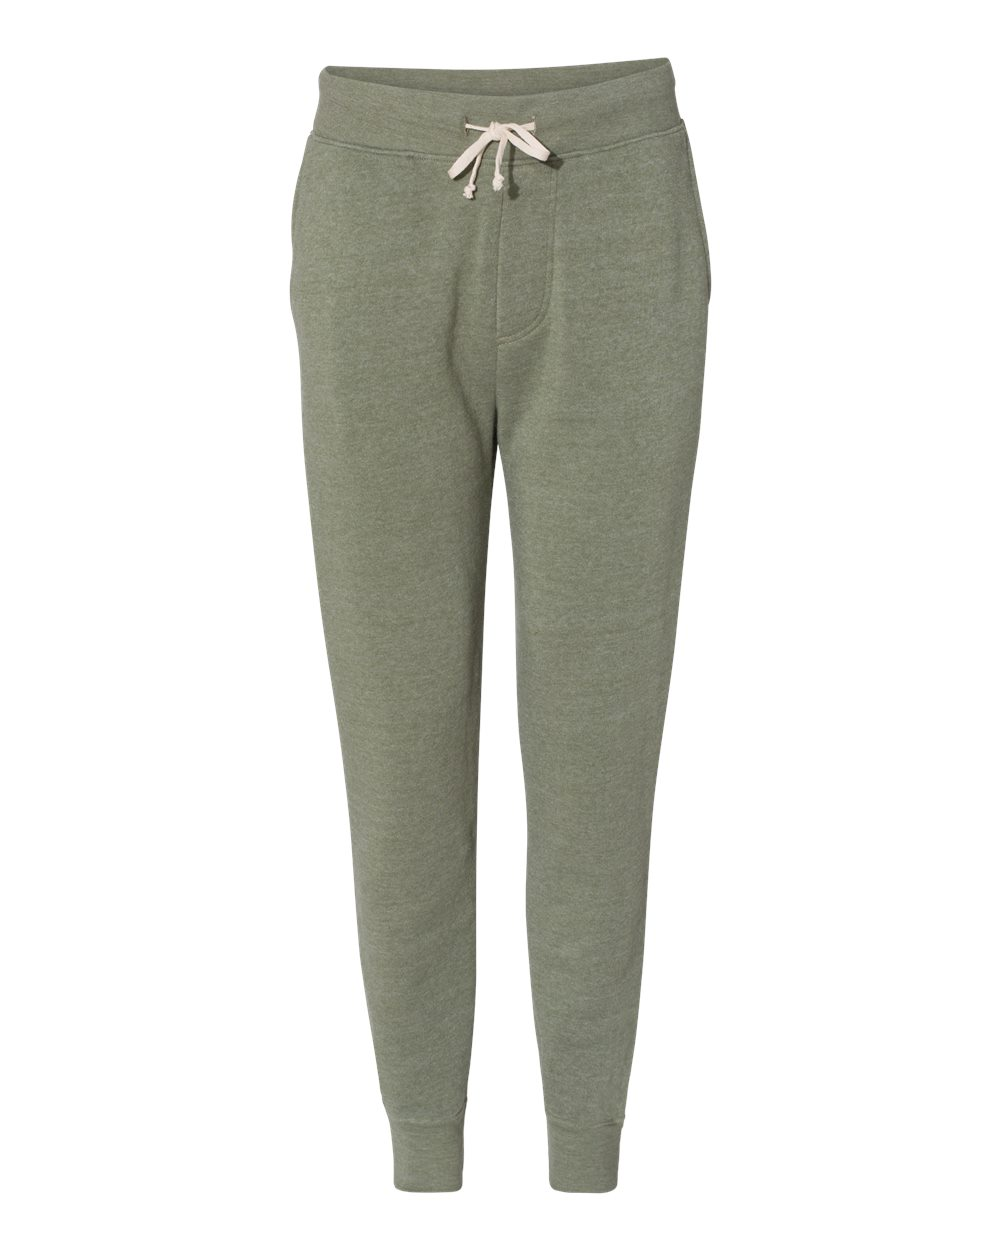 Alternative-Mens-Eco-Fleece-Dodgeball-Pants-Sweatpants-Pocket-9881-up-to-2XL thumbnail 12